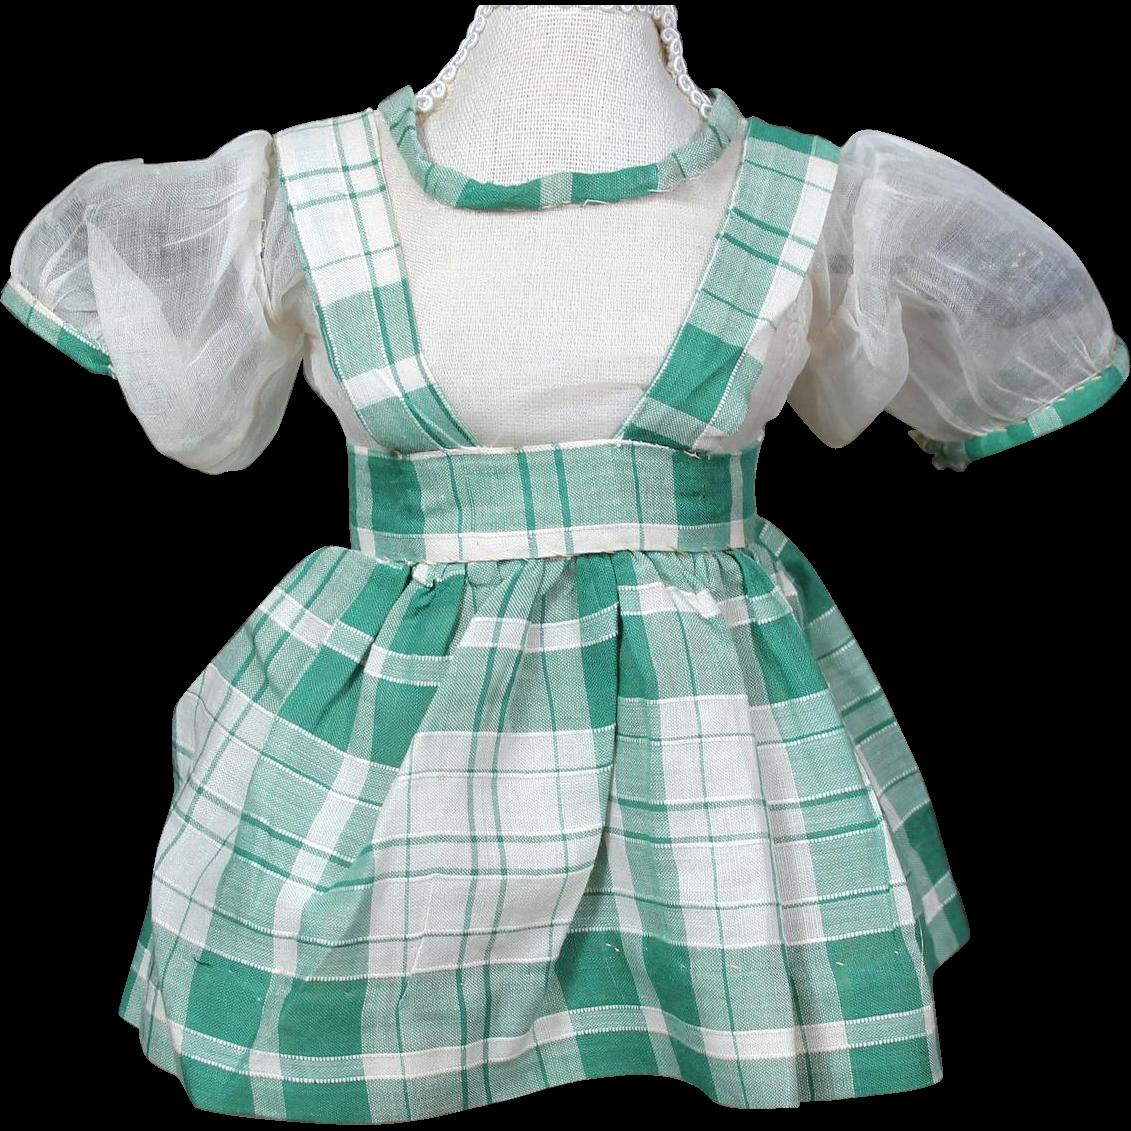 1930's Organdy/Cotton two Piece Plaid Dress